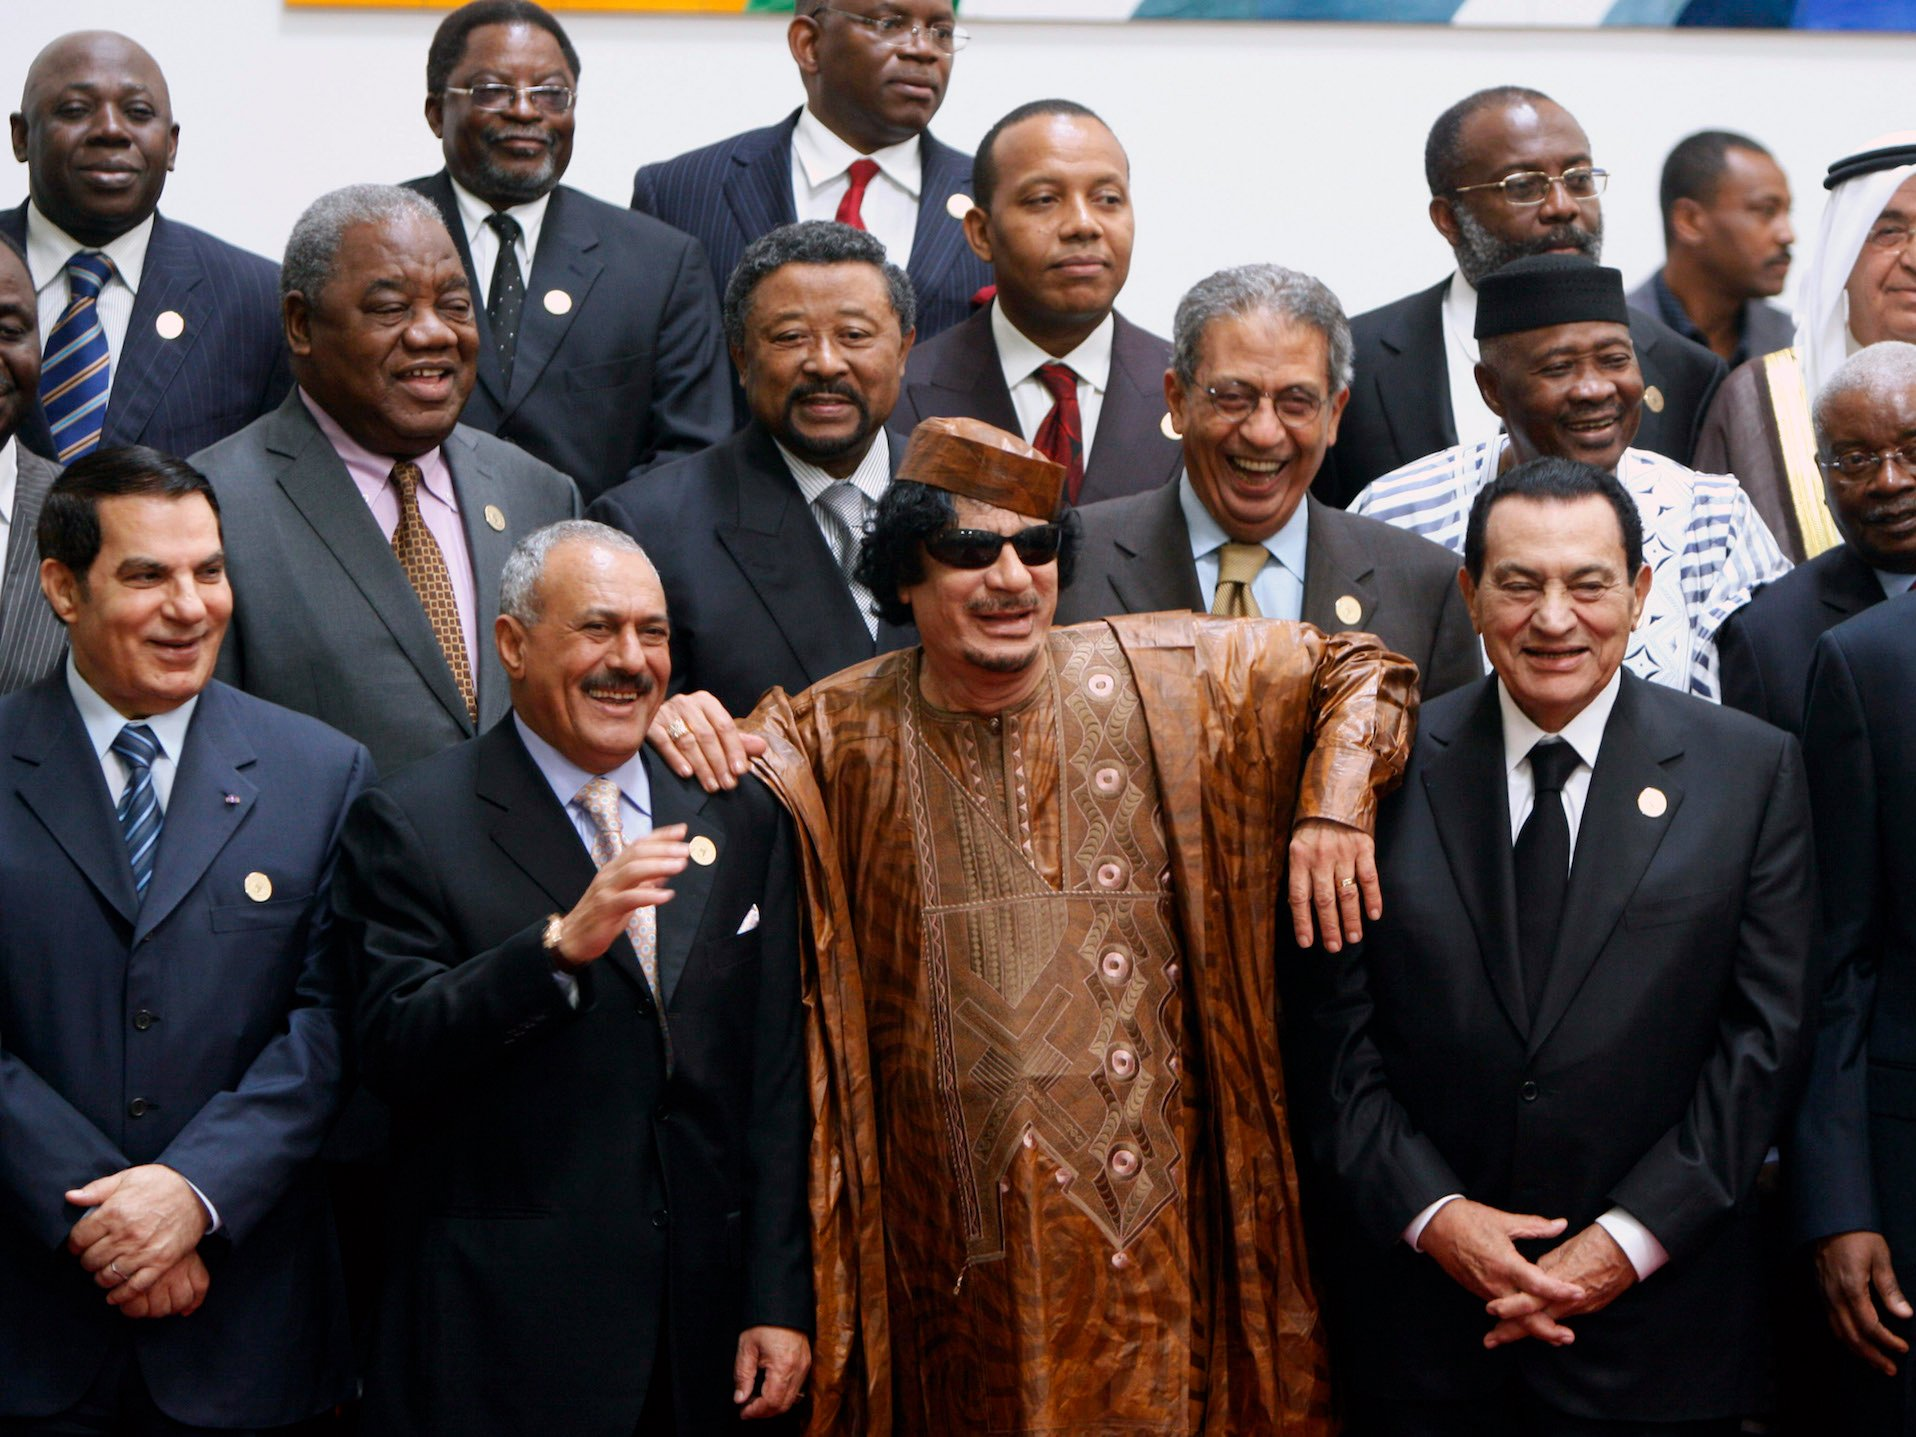 moammar gadhafi hosni mubarak ali abdullah saleh zine el abidine ben ali